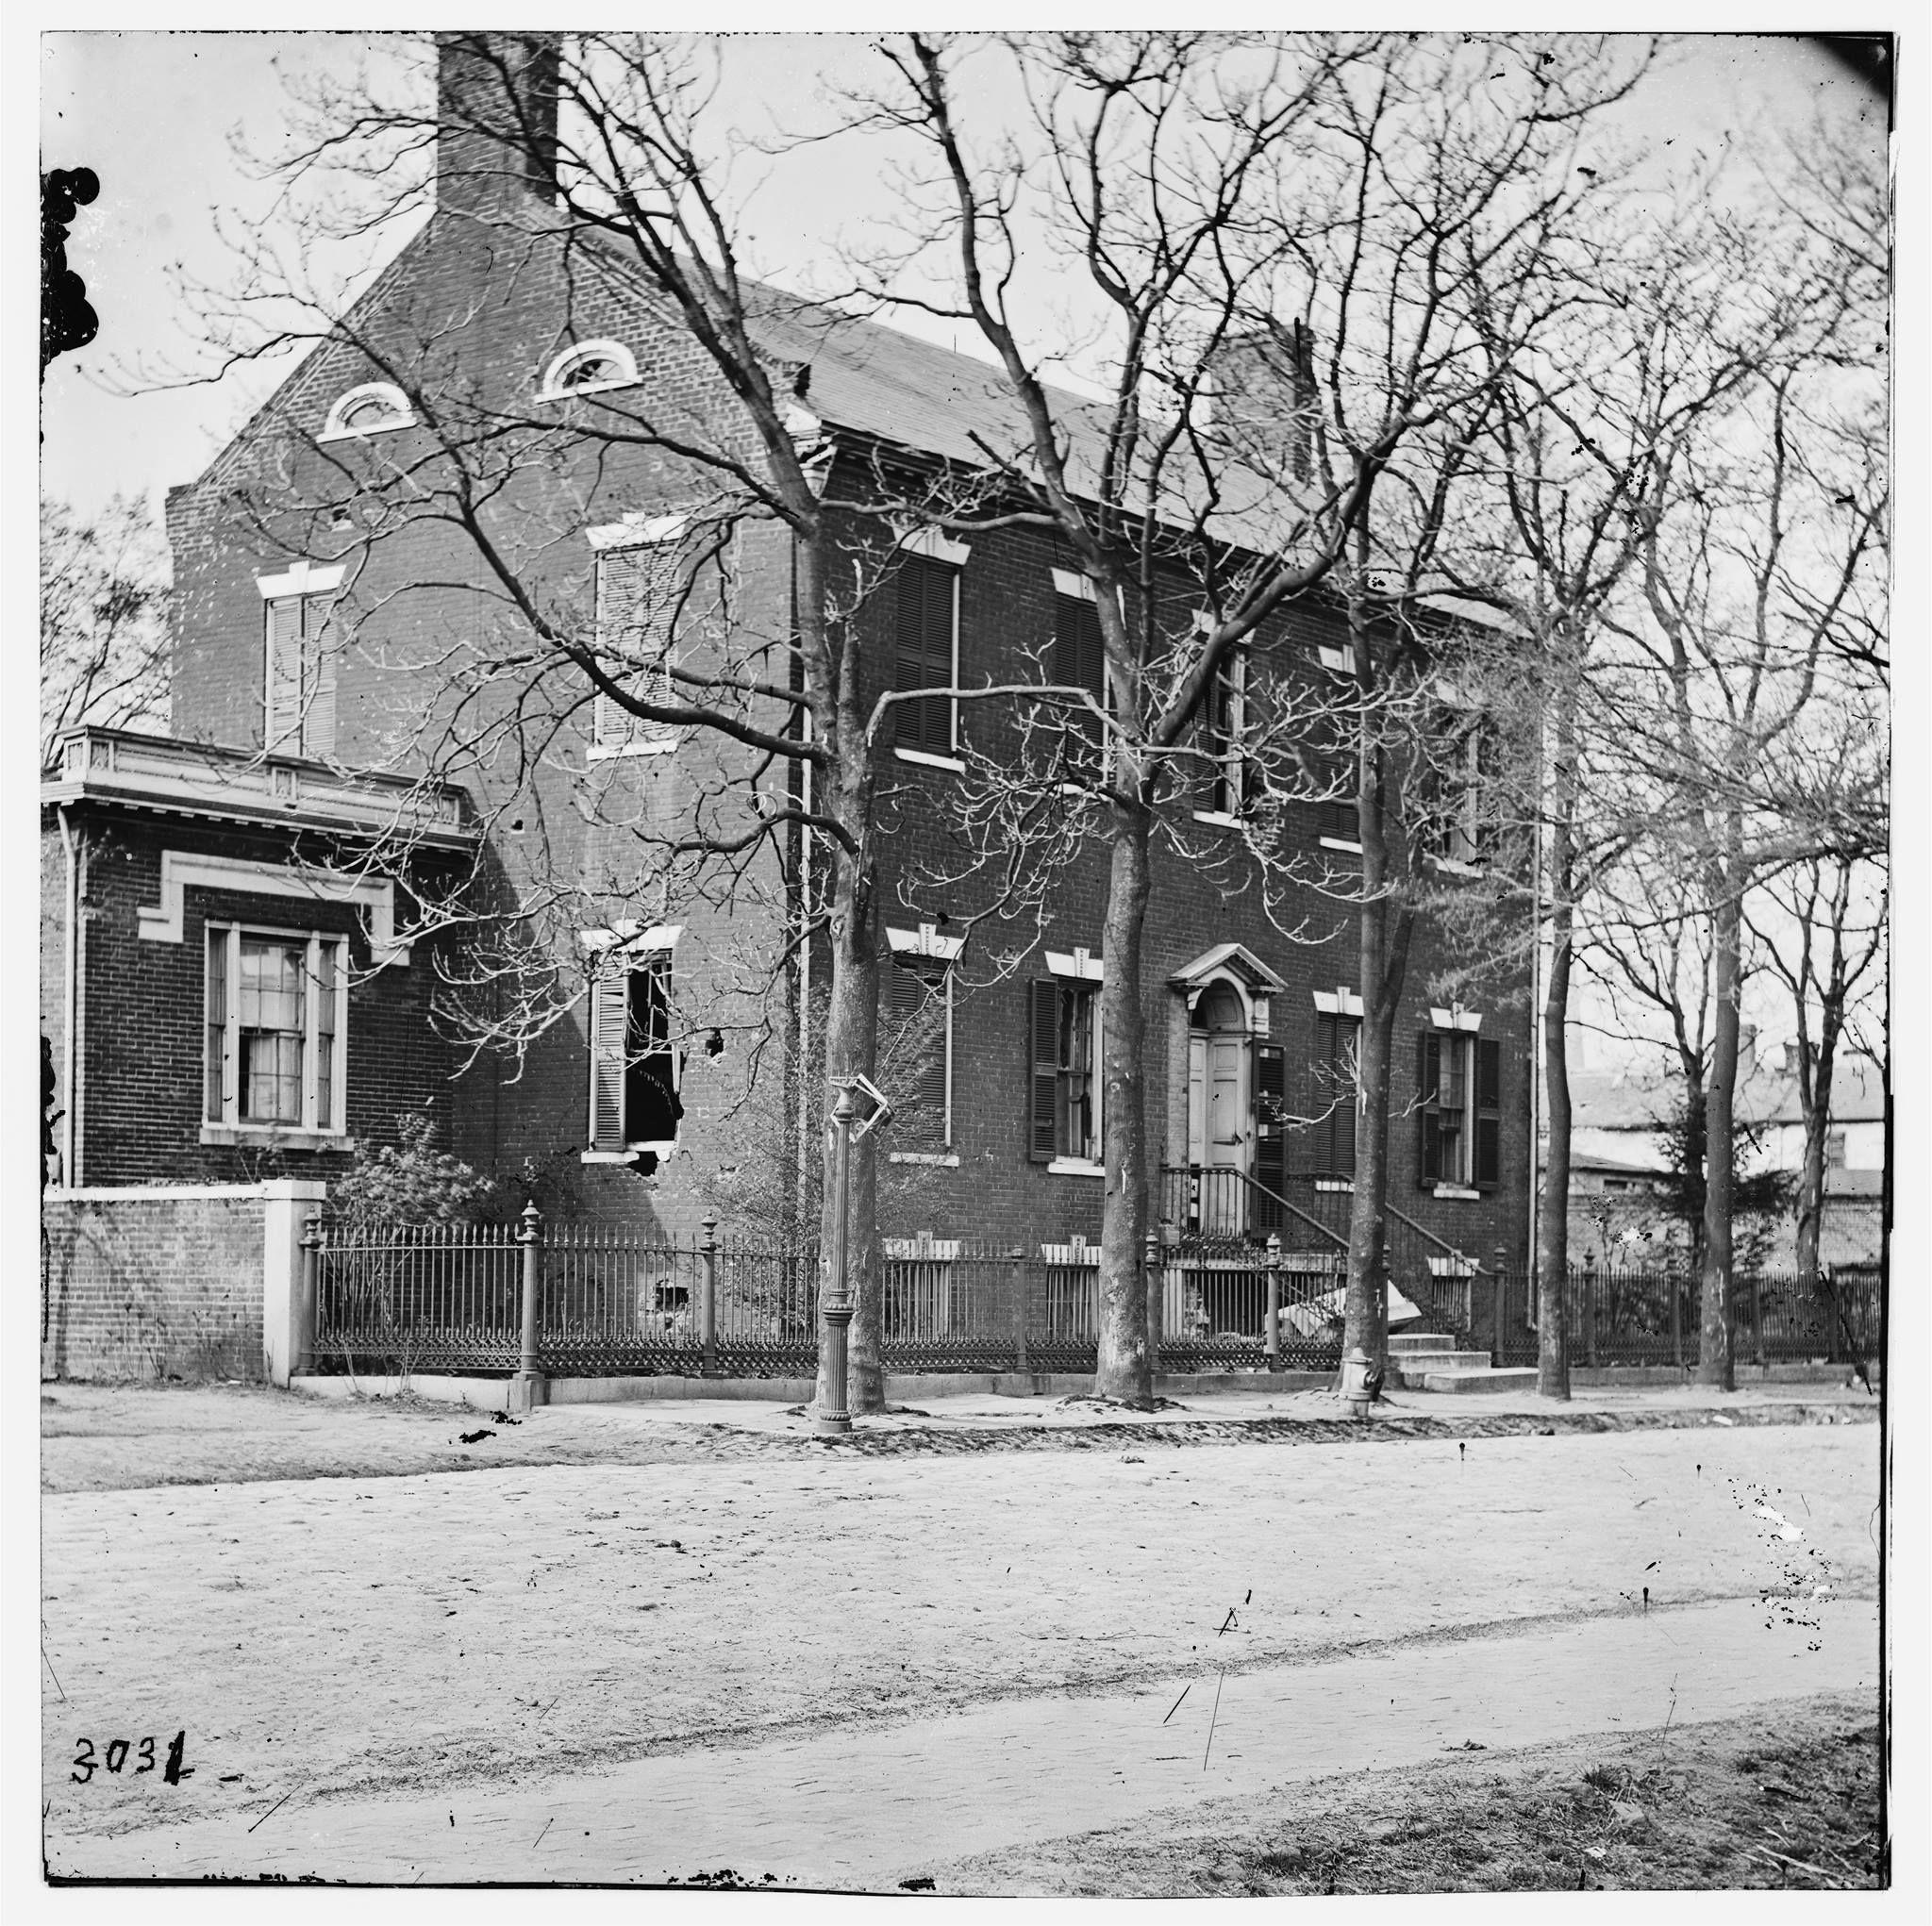 Petersburg Virginia Civil War Damaged House On Bollingbrook